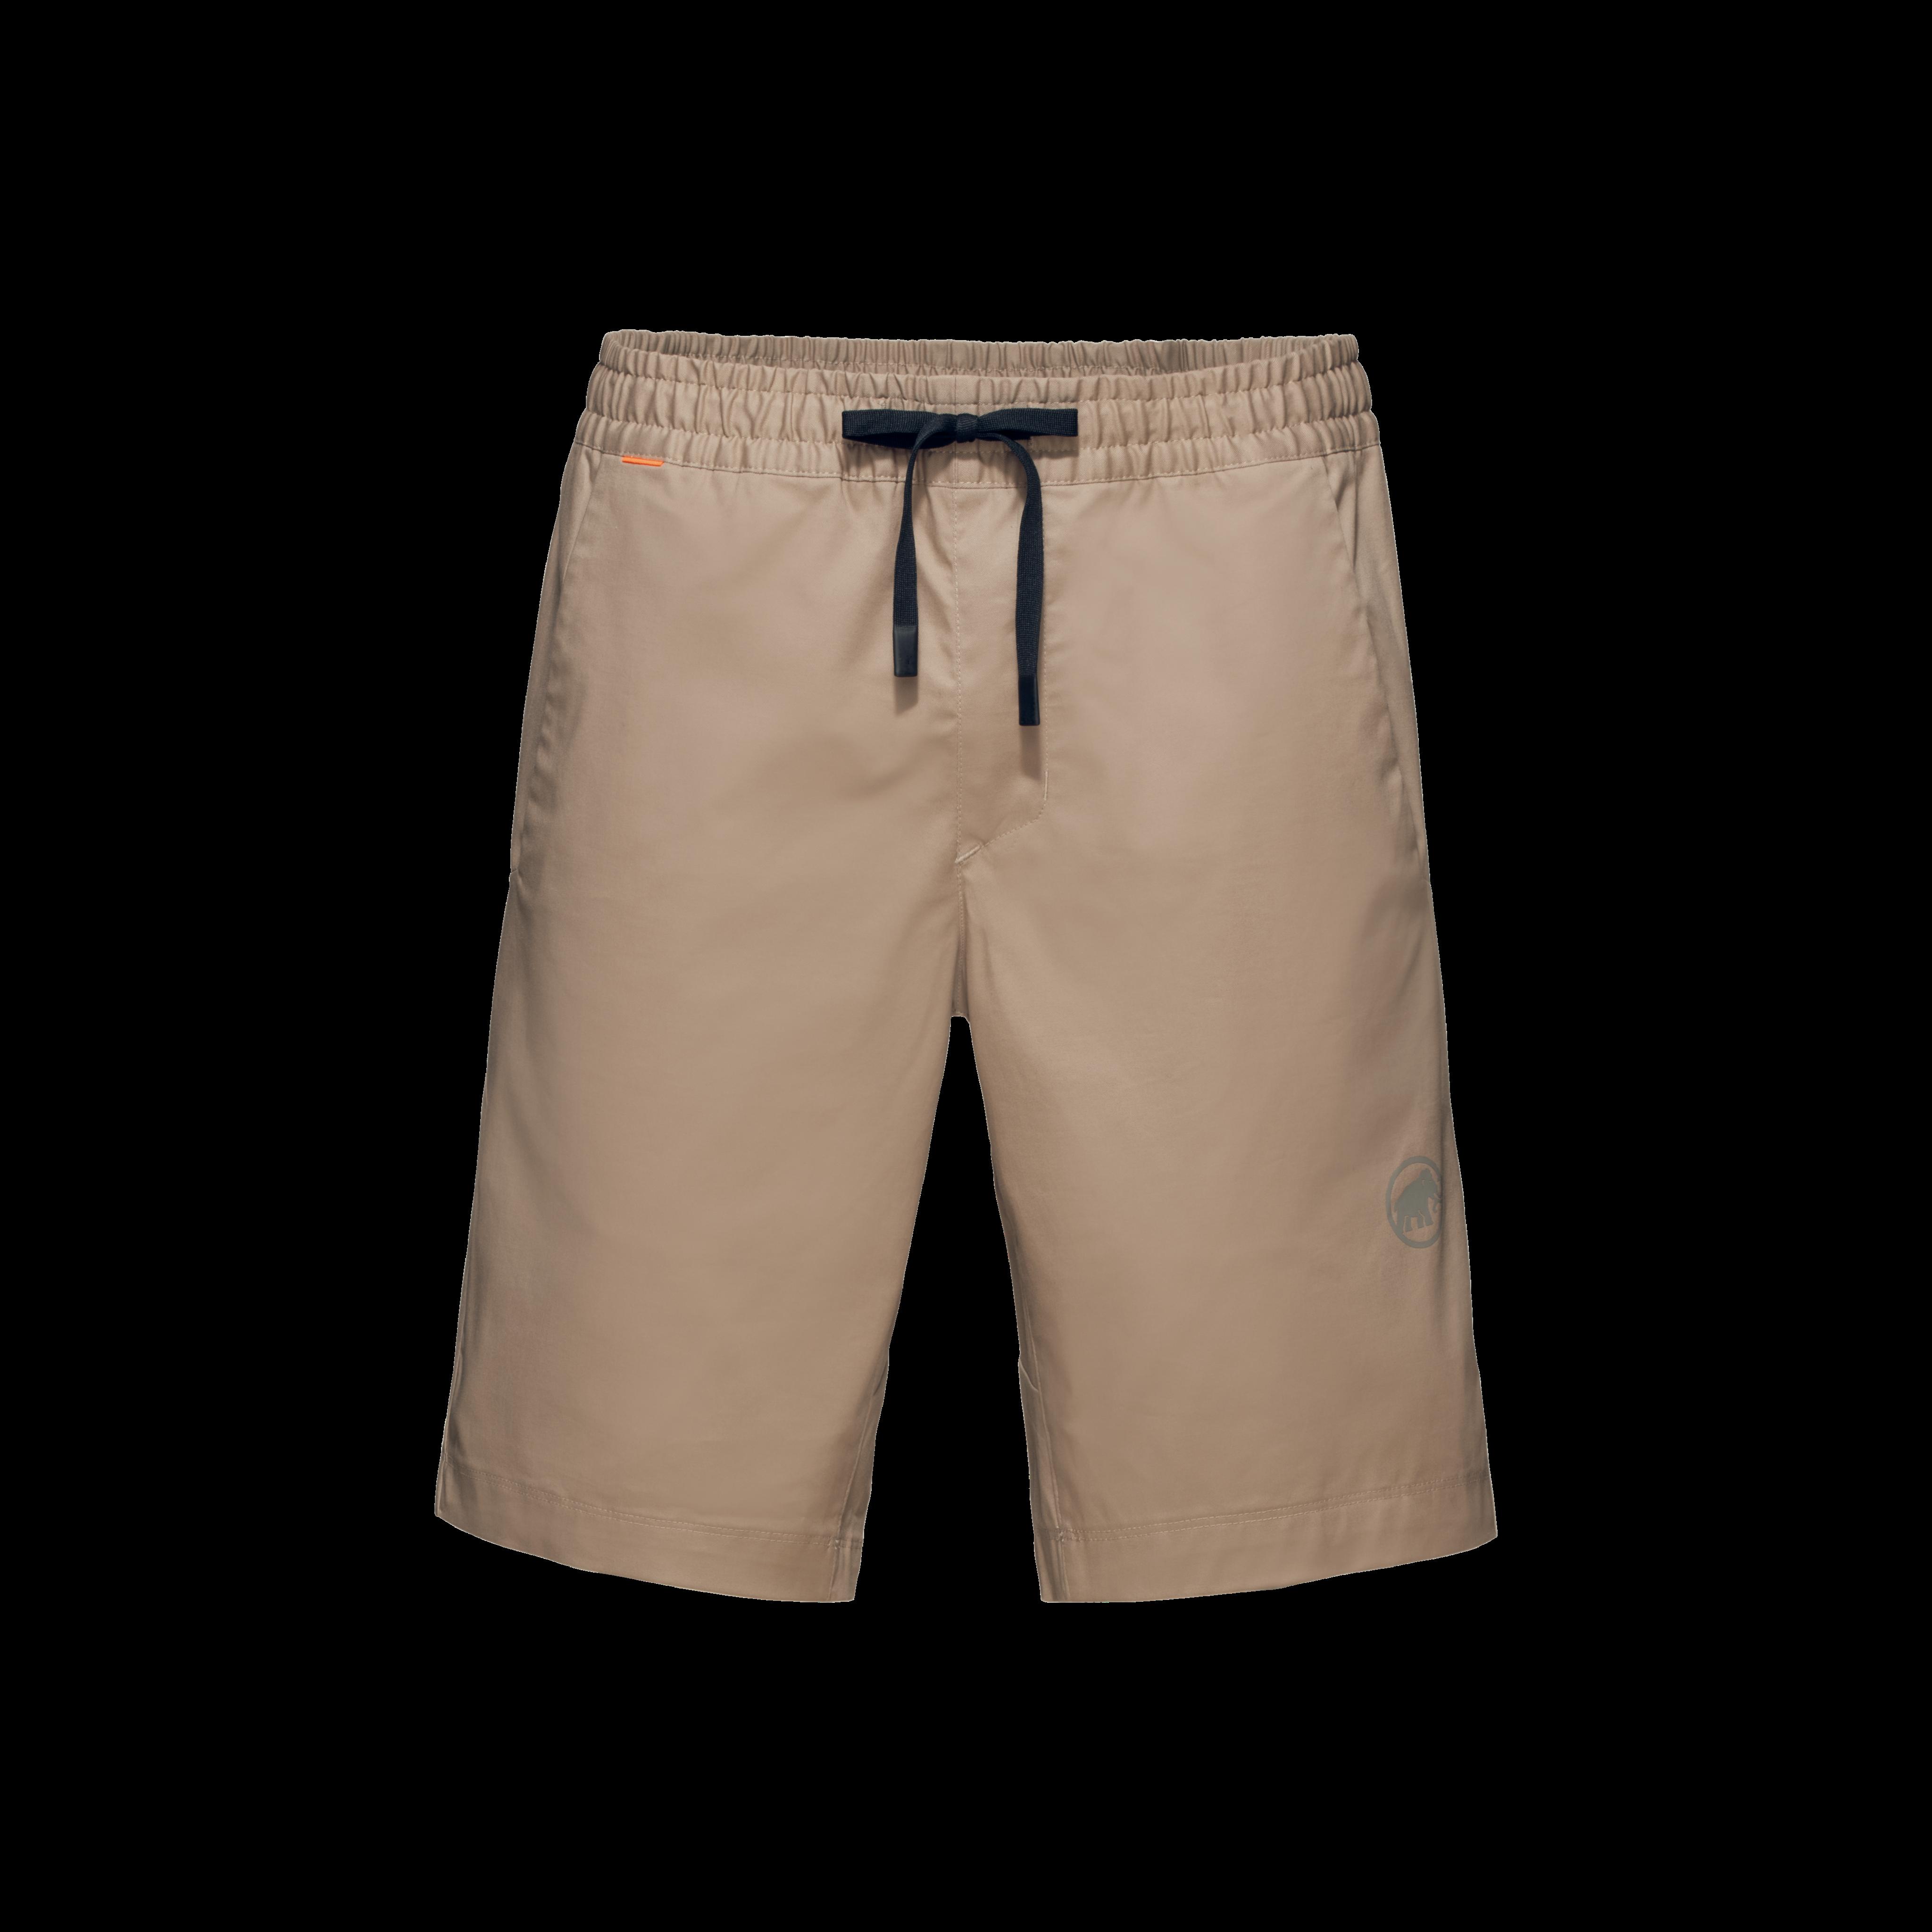 Camie Shorts Men - safari, UK 32 thumbnail